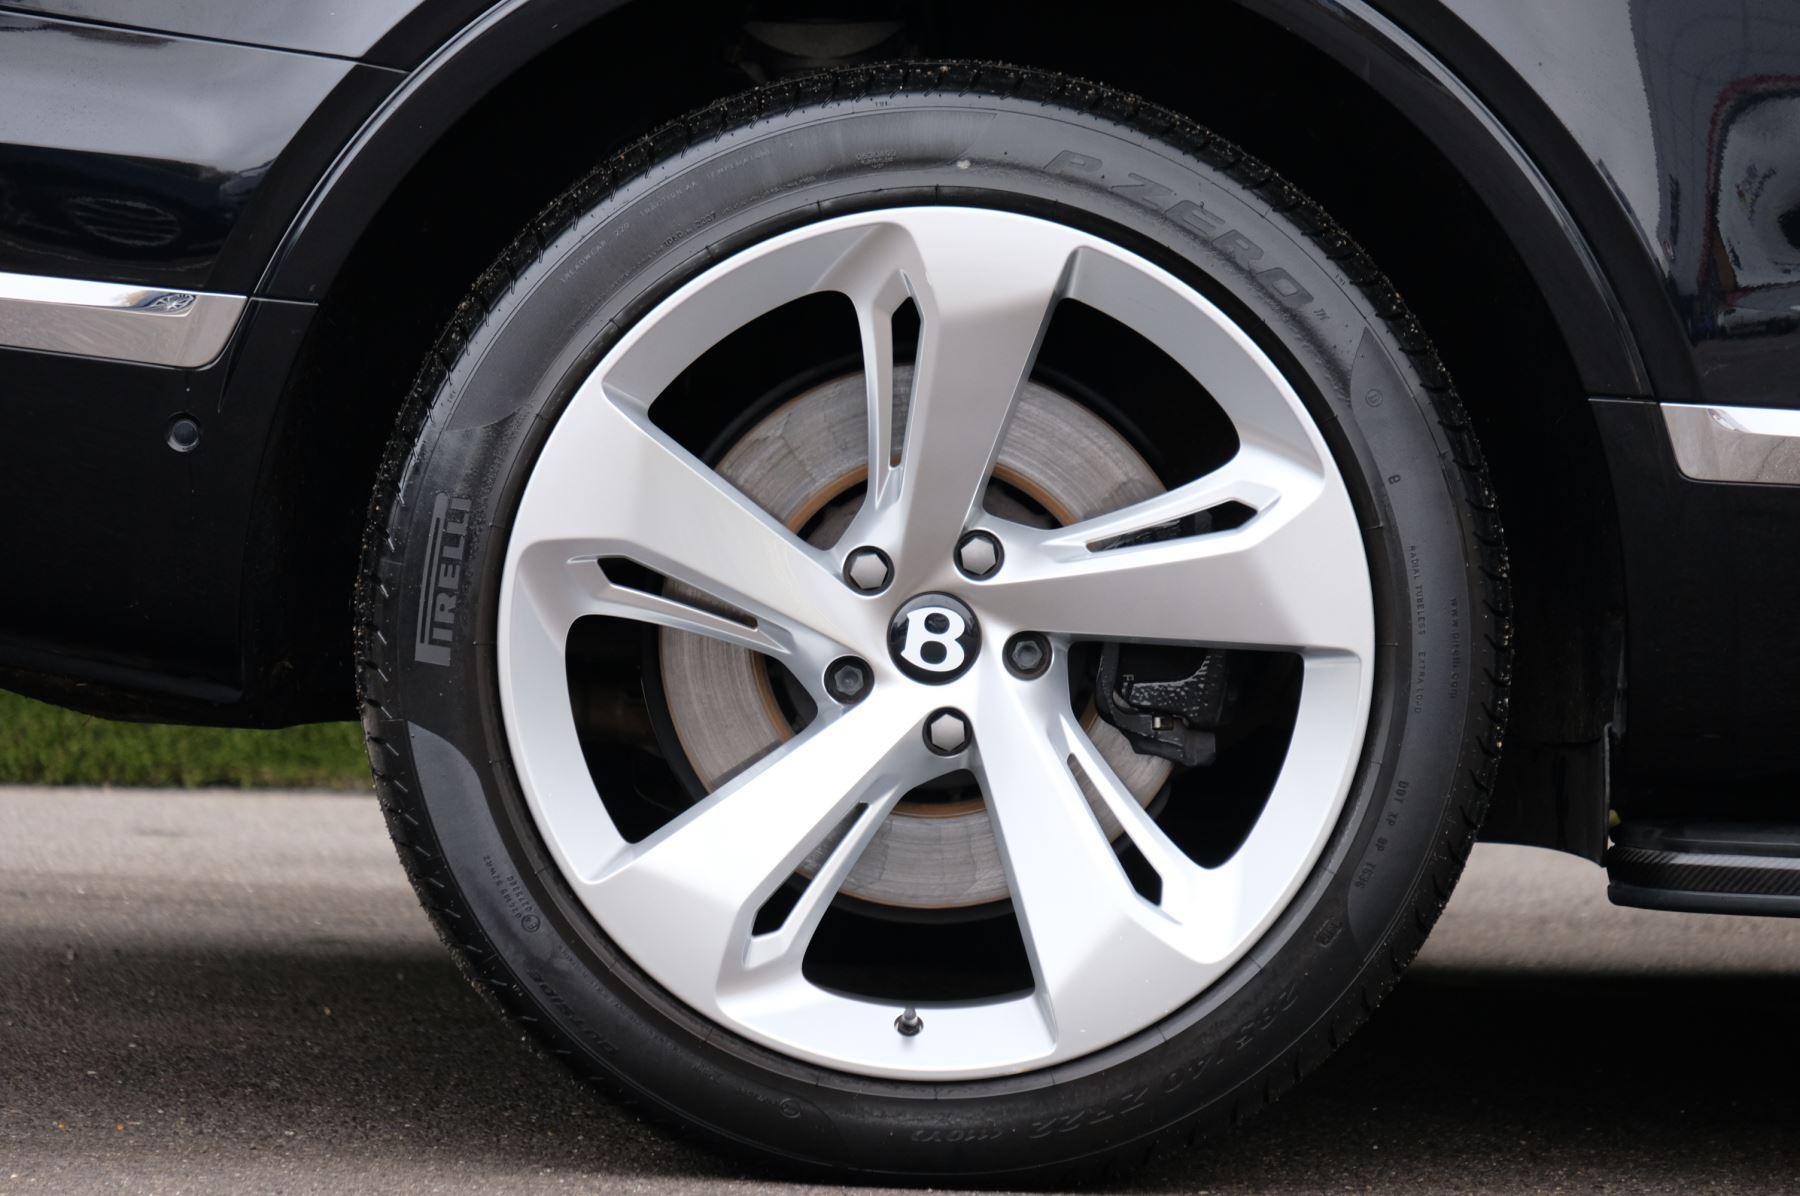 Bentley Bentayga Diesel 4.0 V8 Mulliner Driving Spec 5dr Auto - 7 Seat Specification image 8